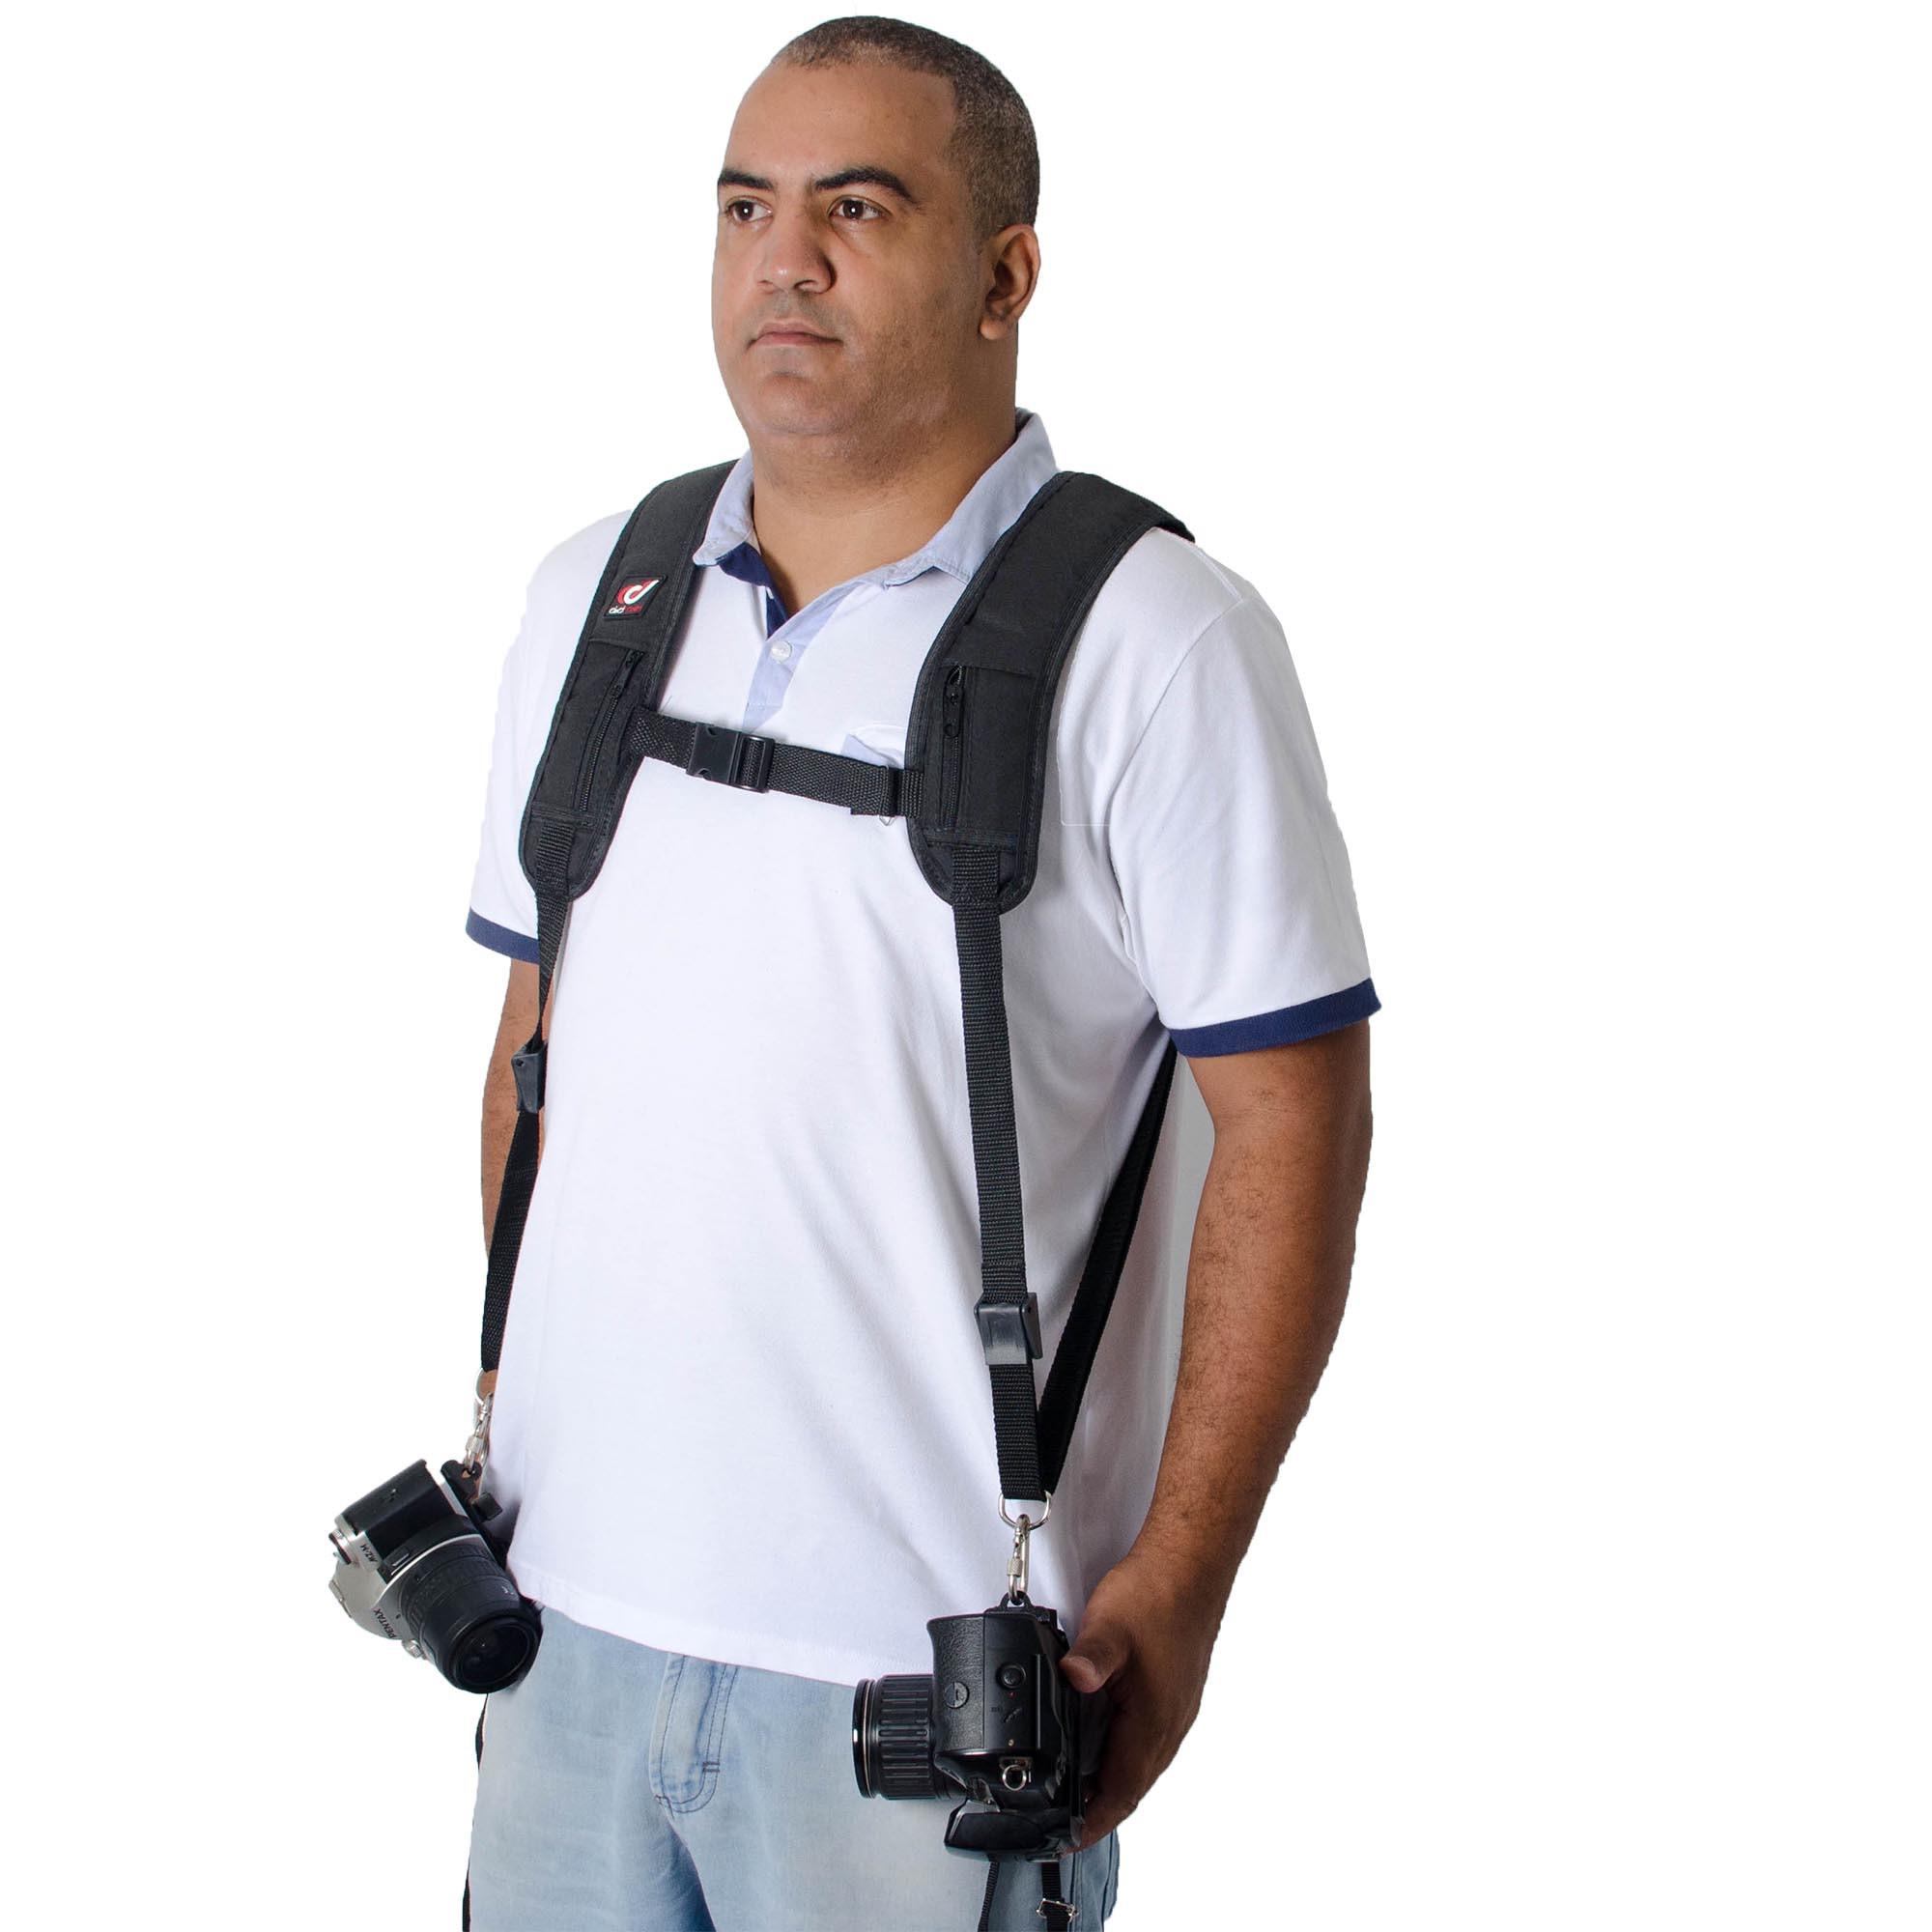 kit Mochila Fotografica + alça Photopro Oreon Profissional